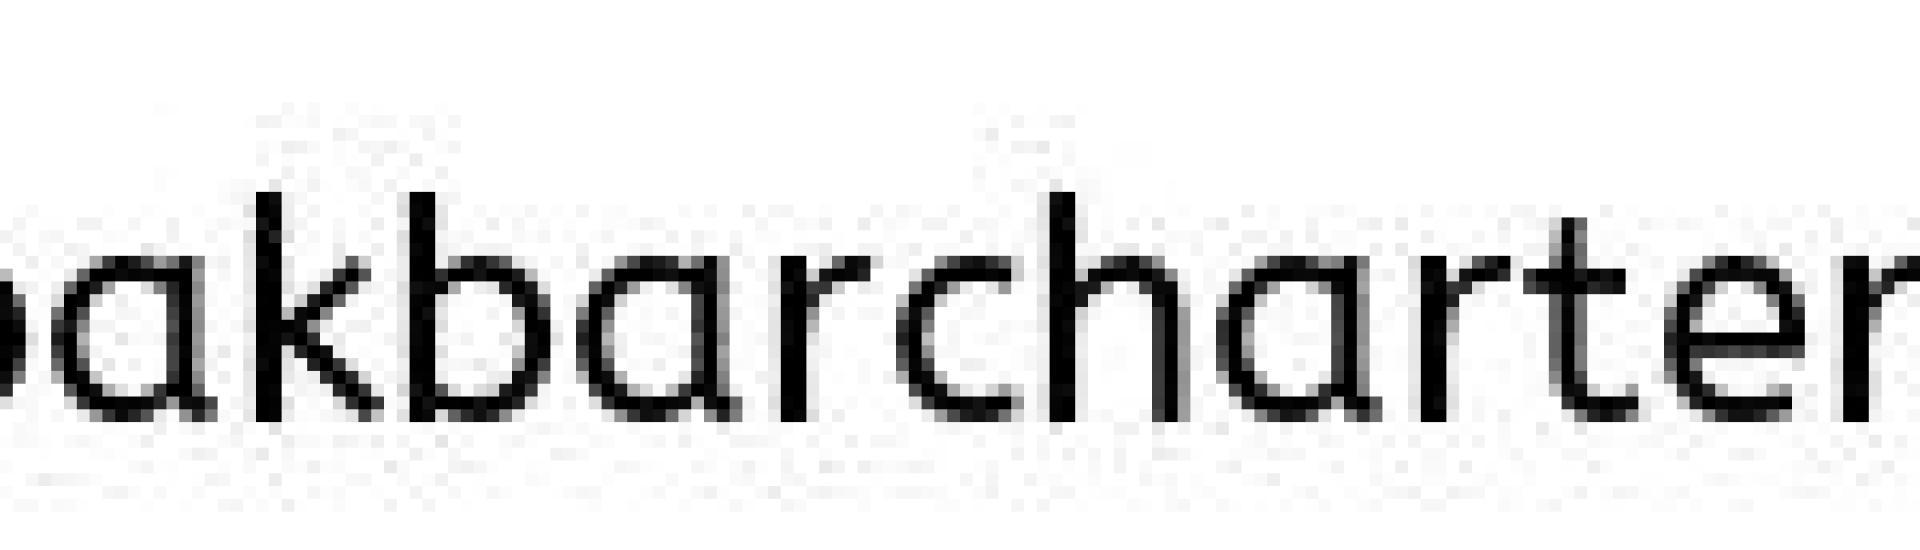 Hatteras Fishing Report – Bak Bar Charters